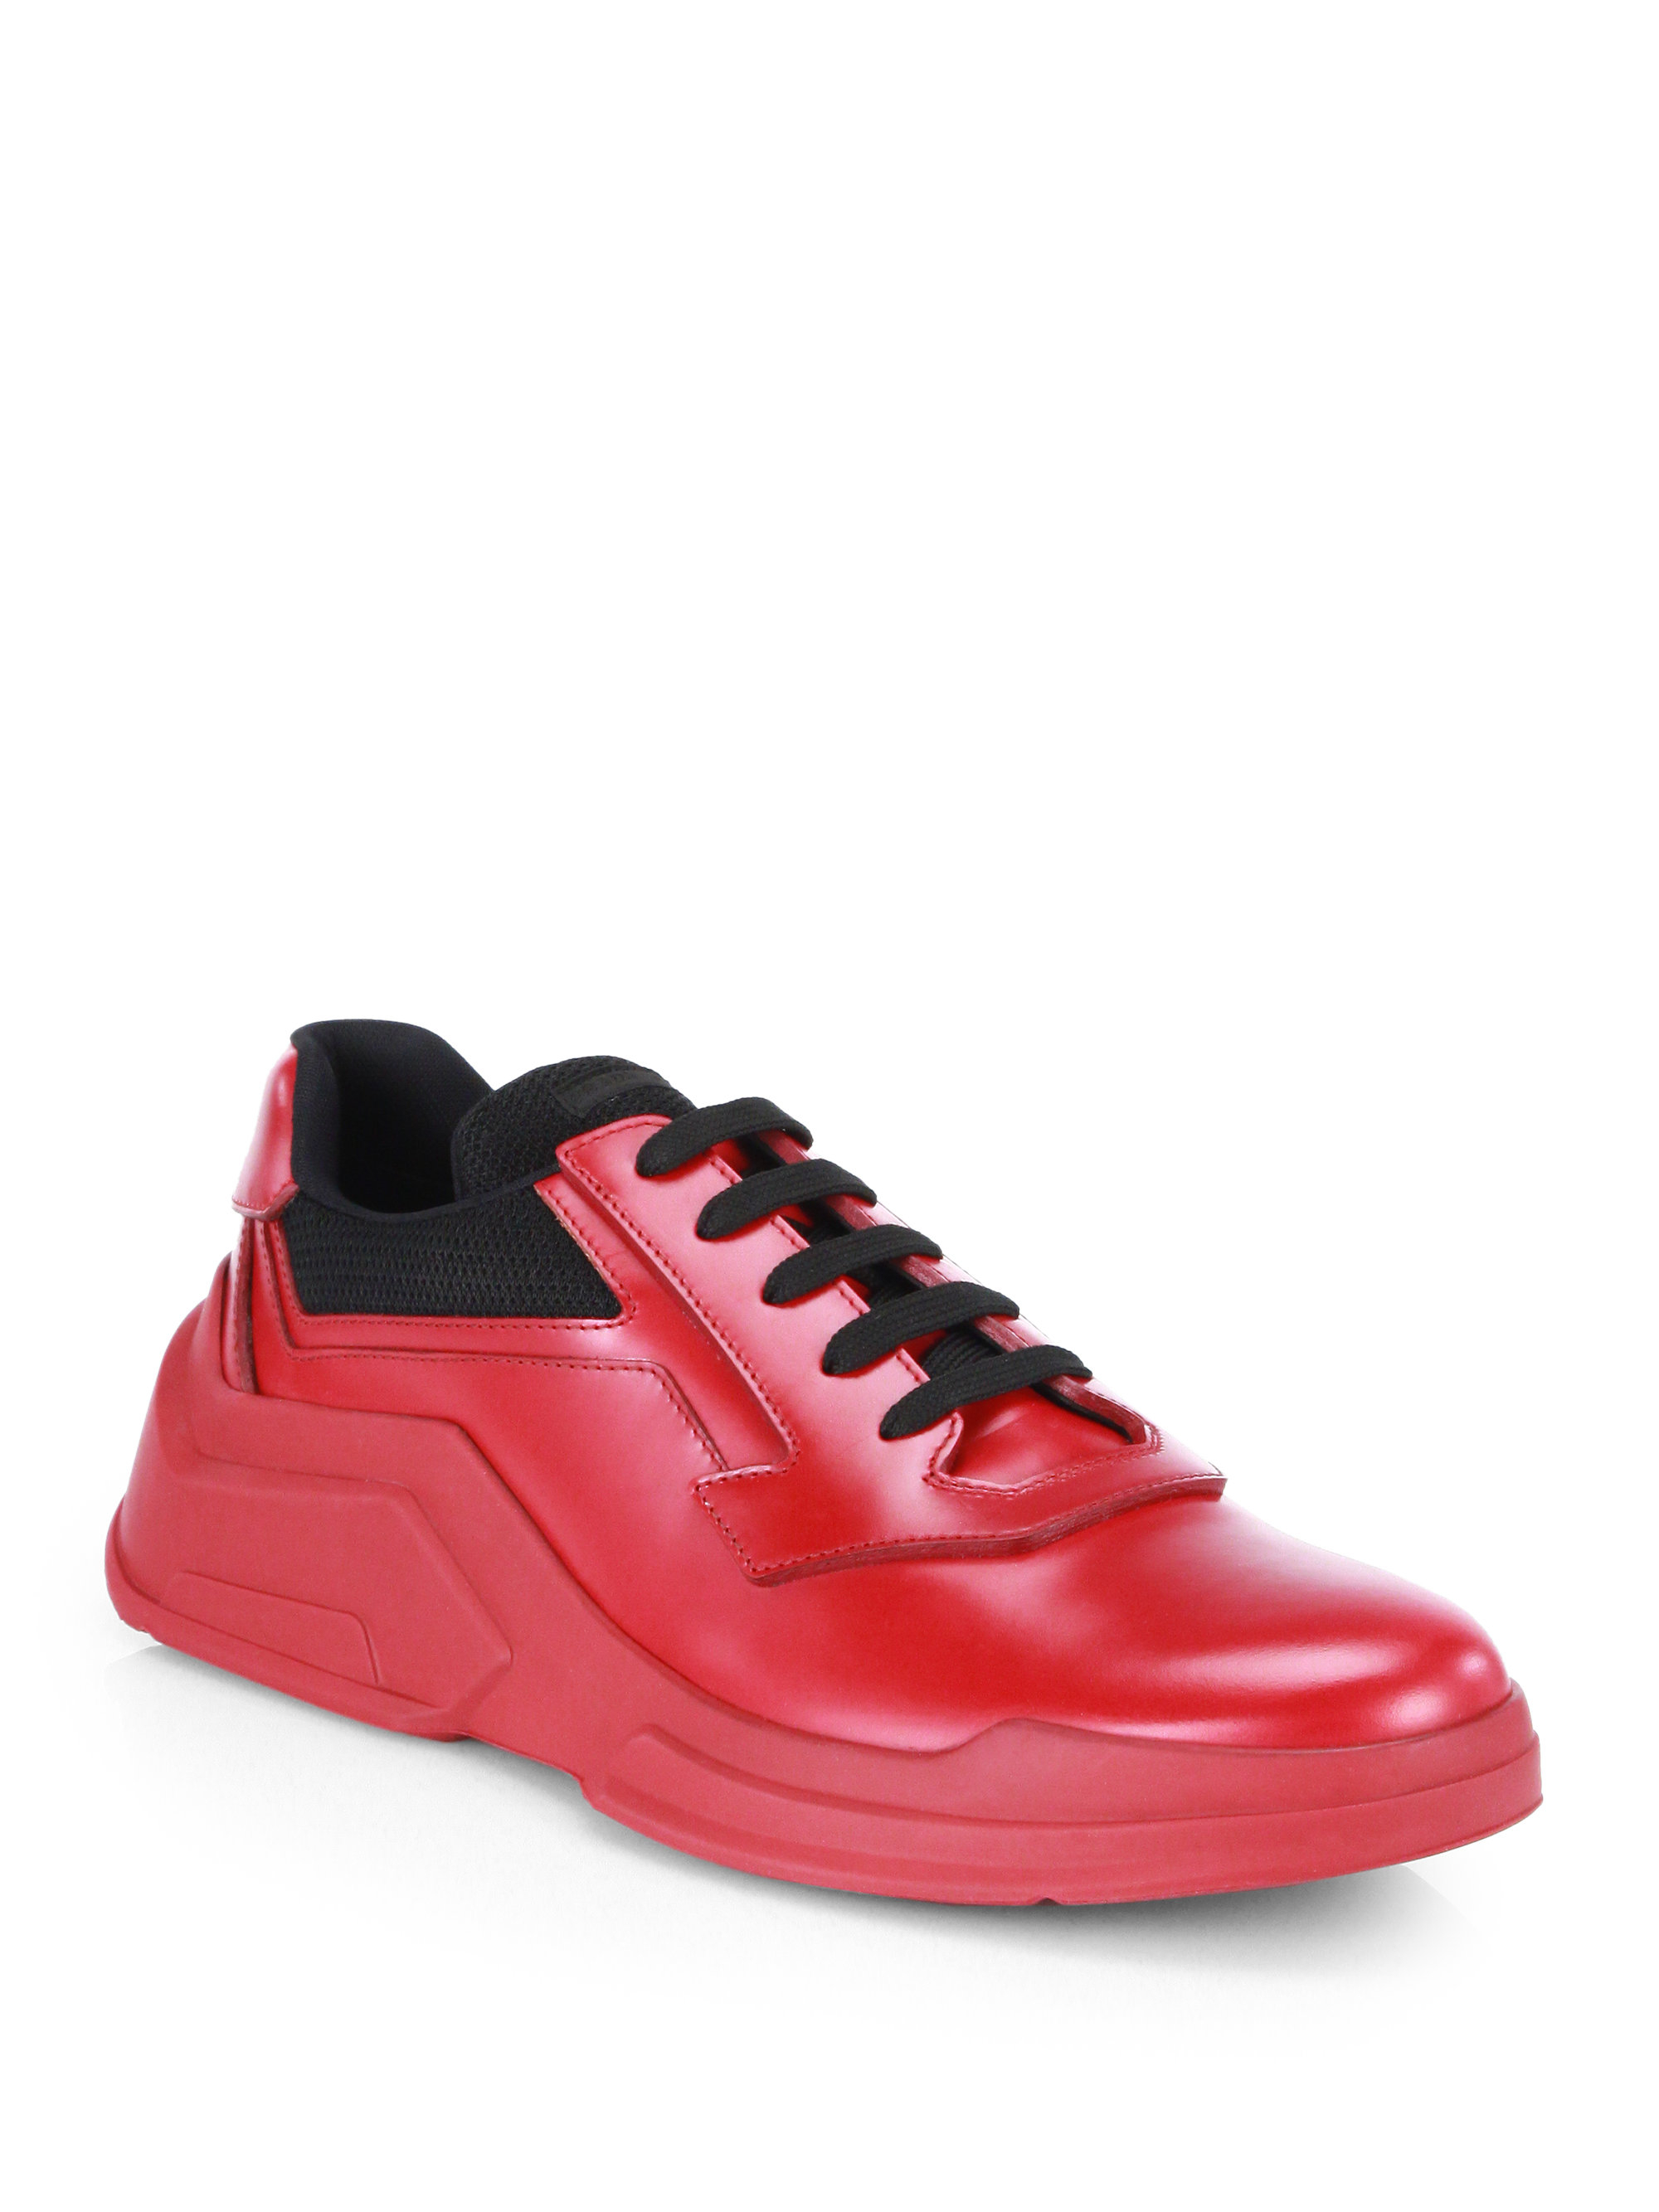 pink leather prada purse - red pradas, borsa Prada viola